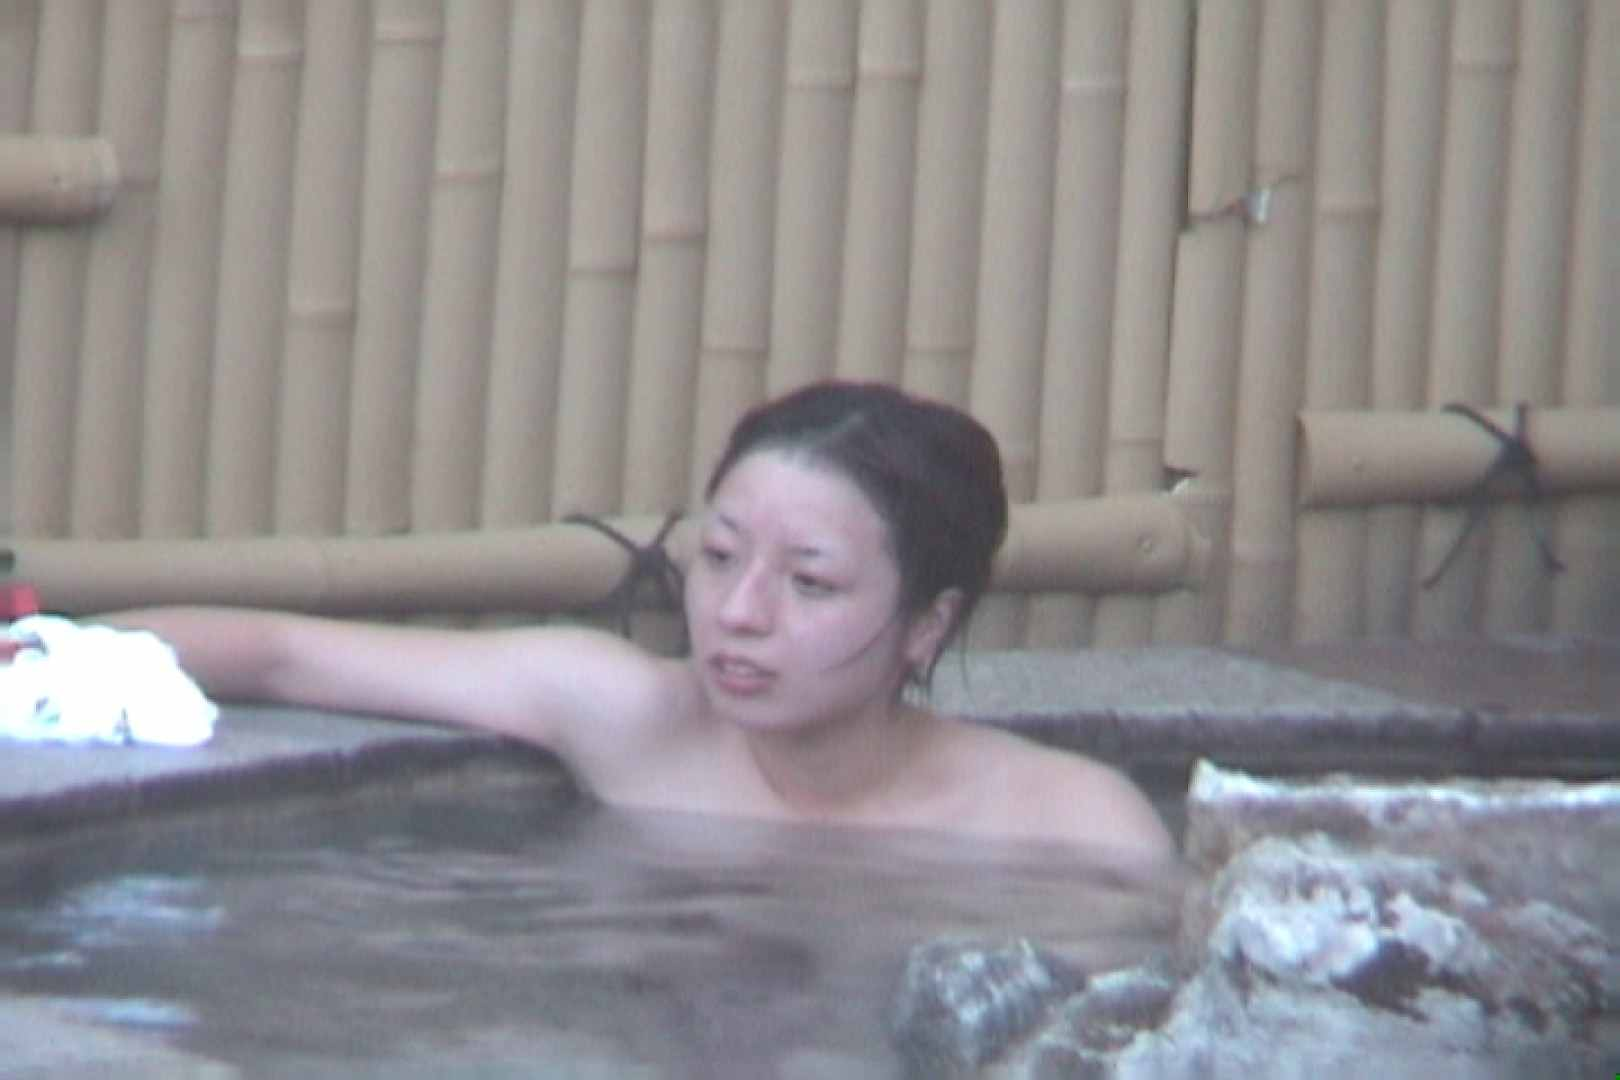 Aquaな露天風呂Vol.608 露天風呂突入 | 盗撮師作品  95pic 52